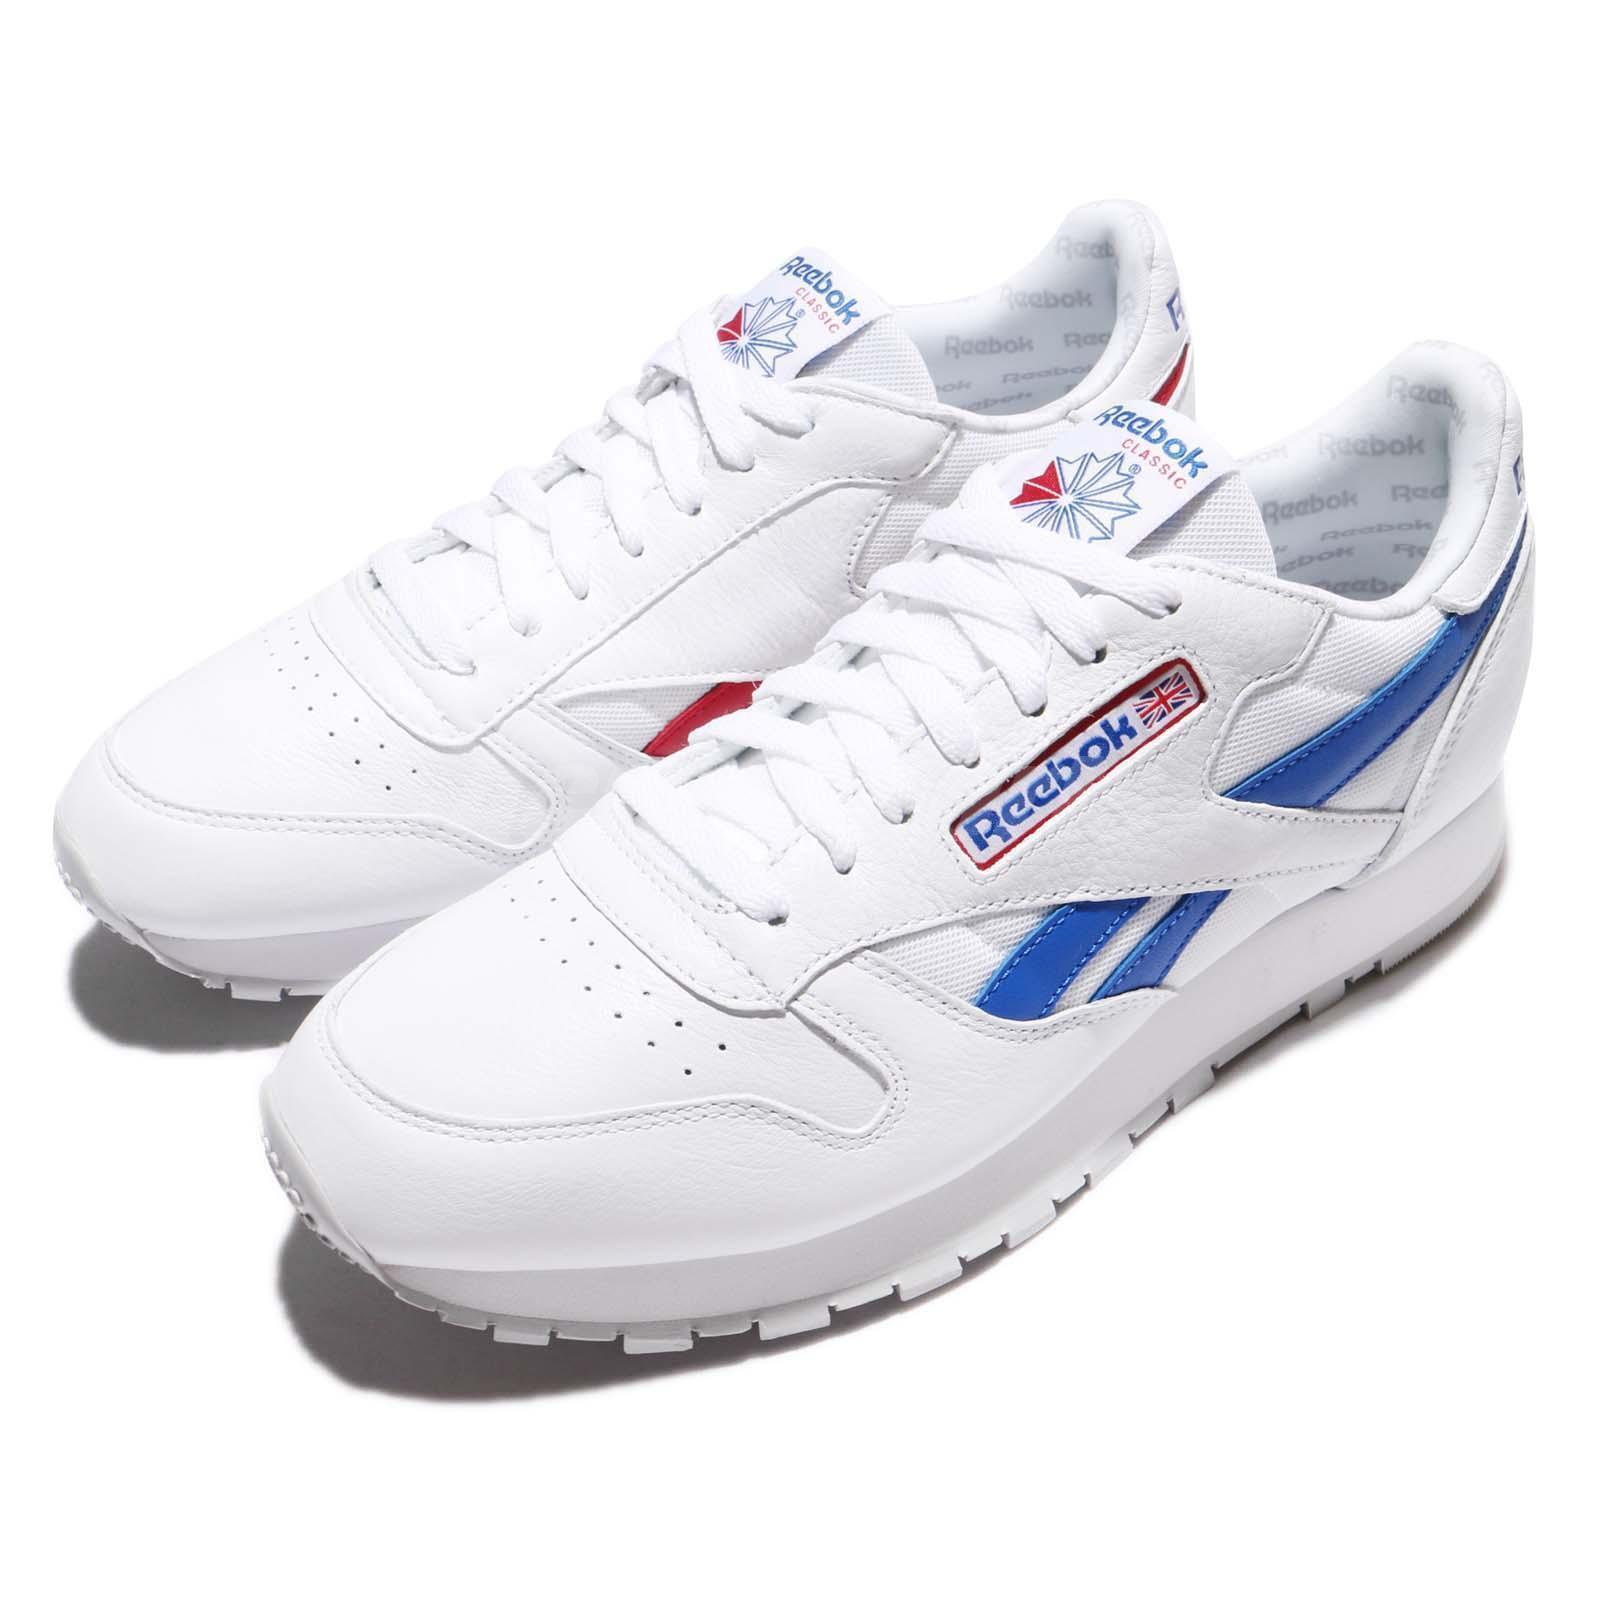 Reebok CL Leather SO White Blue Red uomo Vintage Classic Shoes Sneakers BS5210 Scarpe classiche da uomo